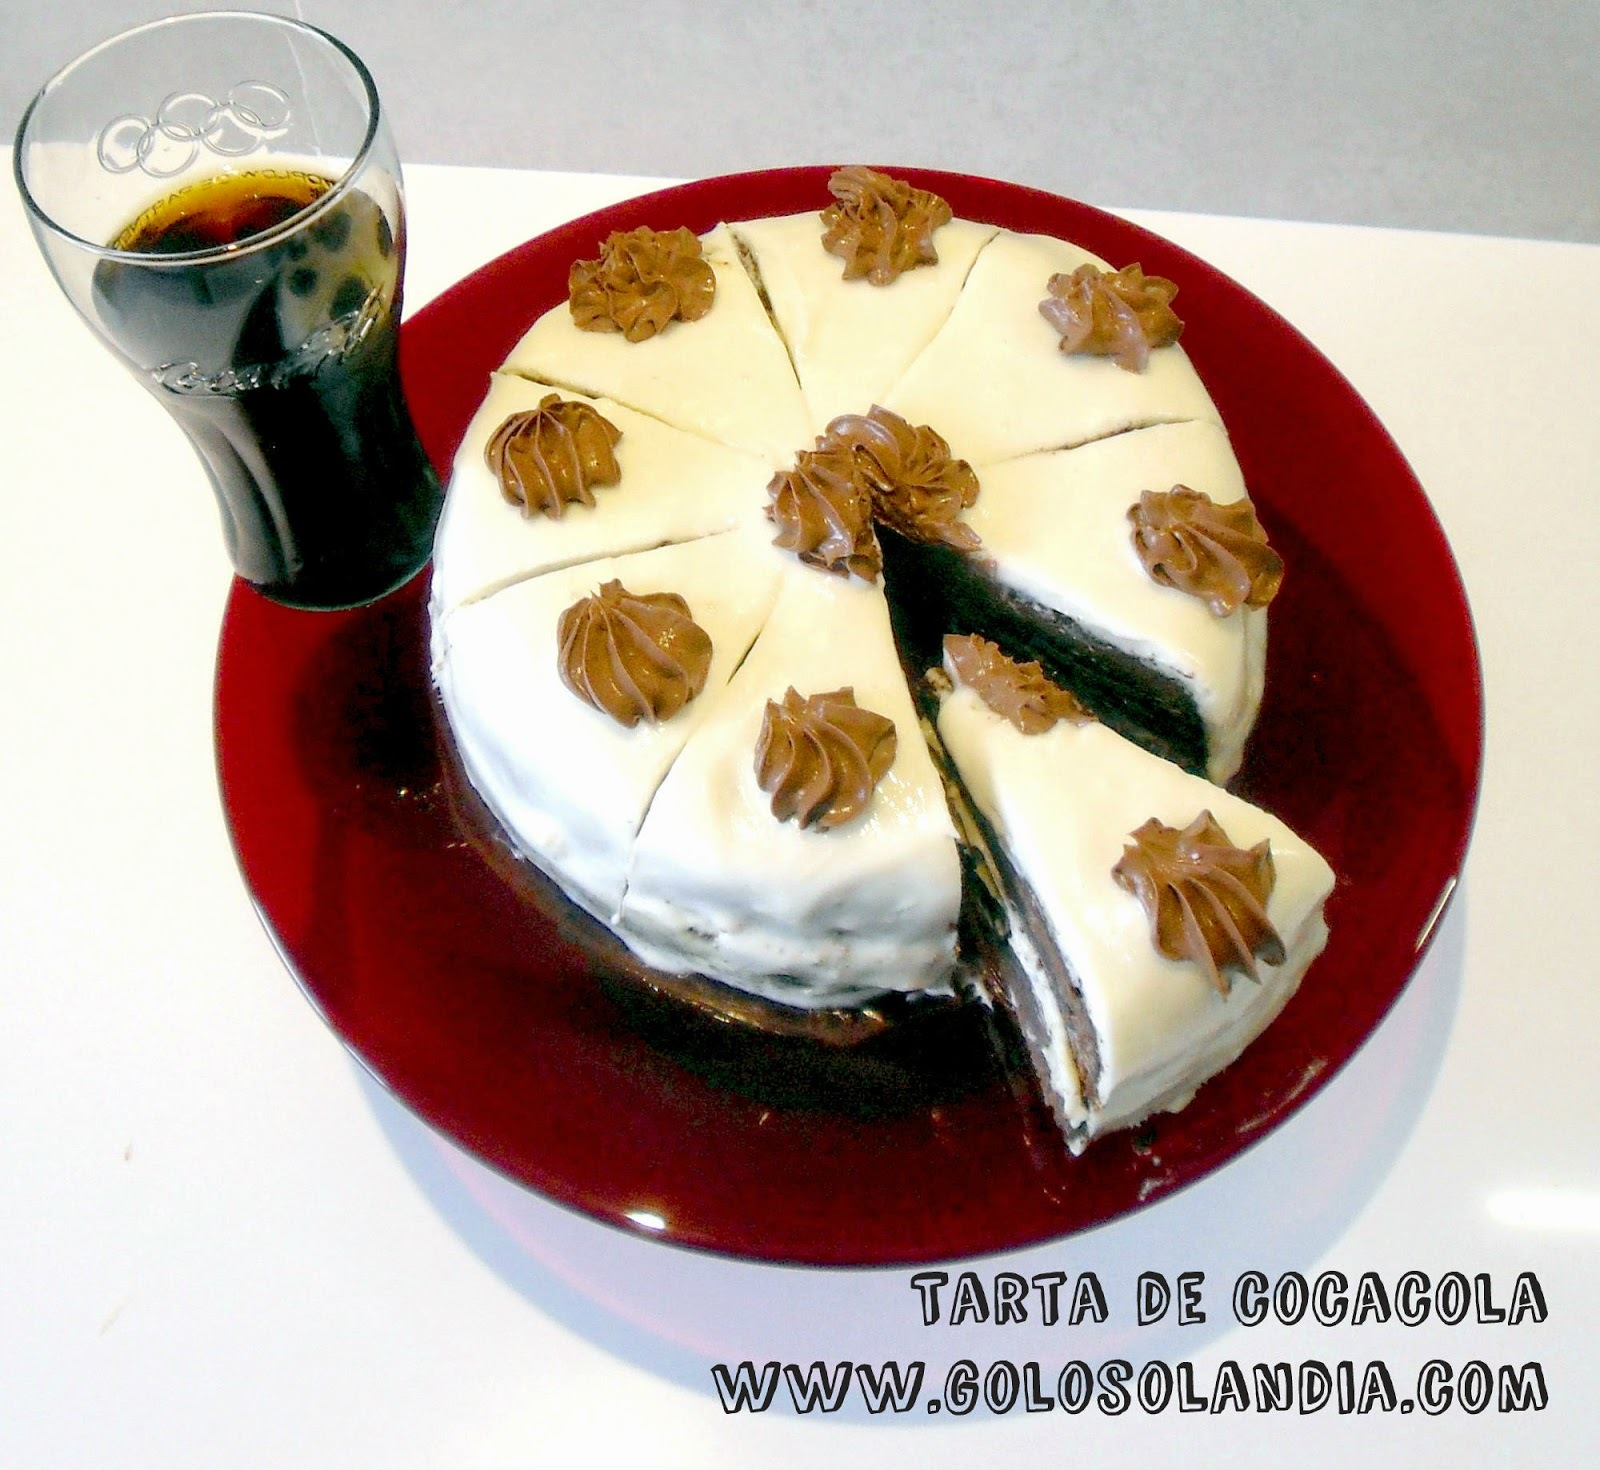 Tarta de Cocacola